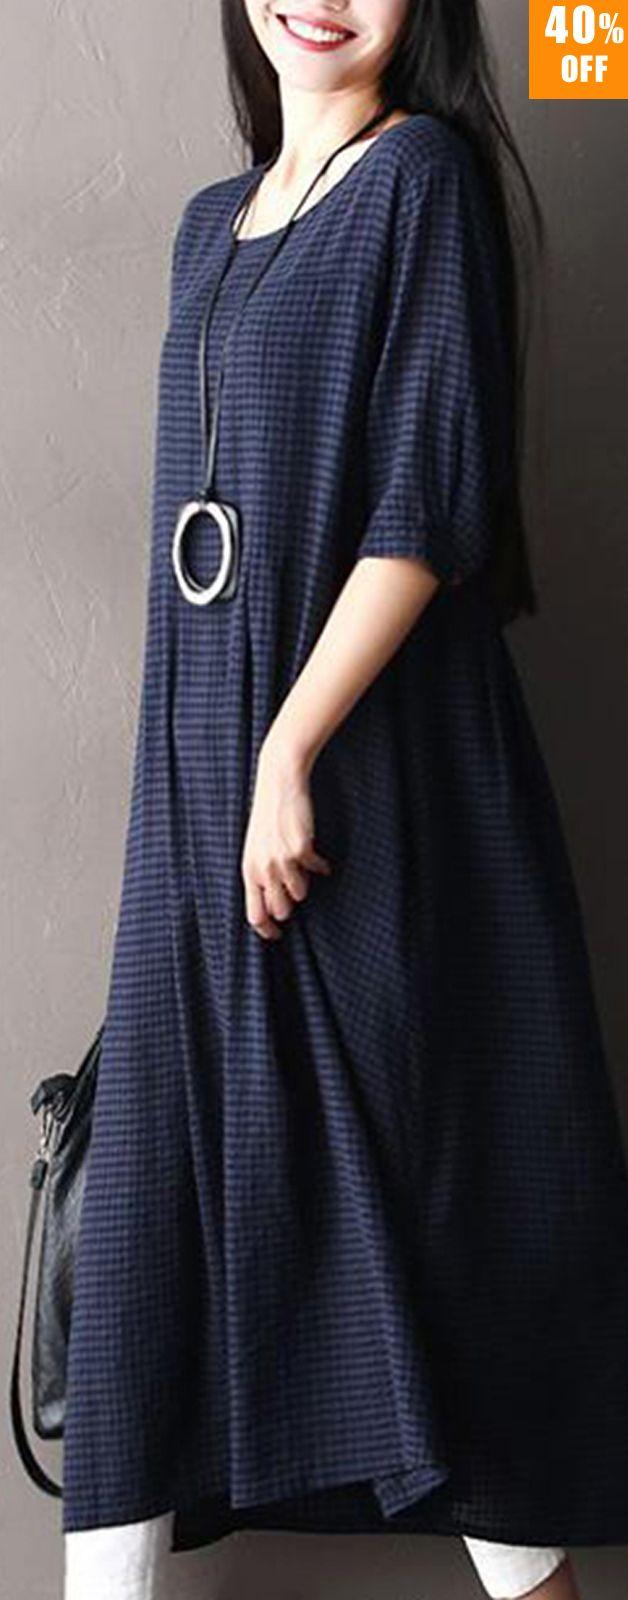 O-NEWE Plus Size Vintage Women Plaid Half Sleeve Dresses.#women #dresses #vintage